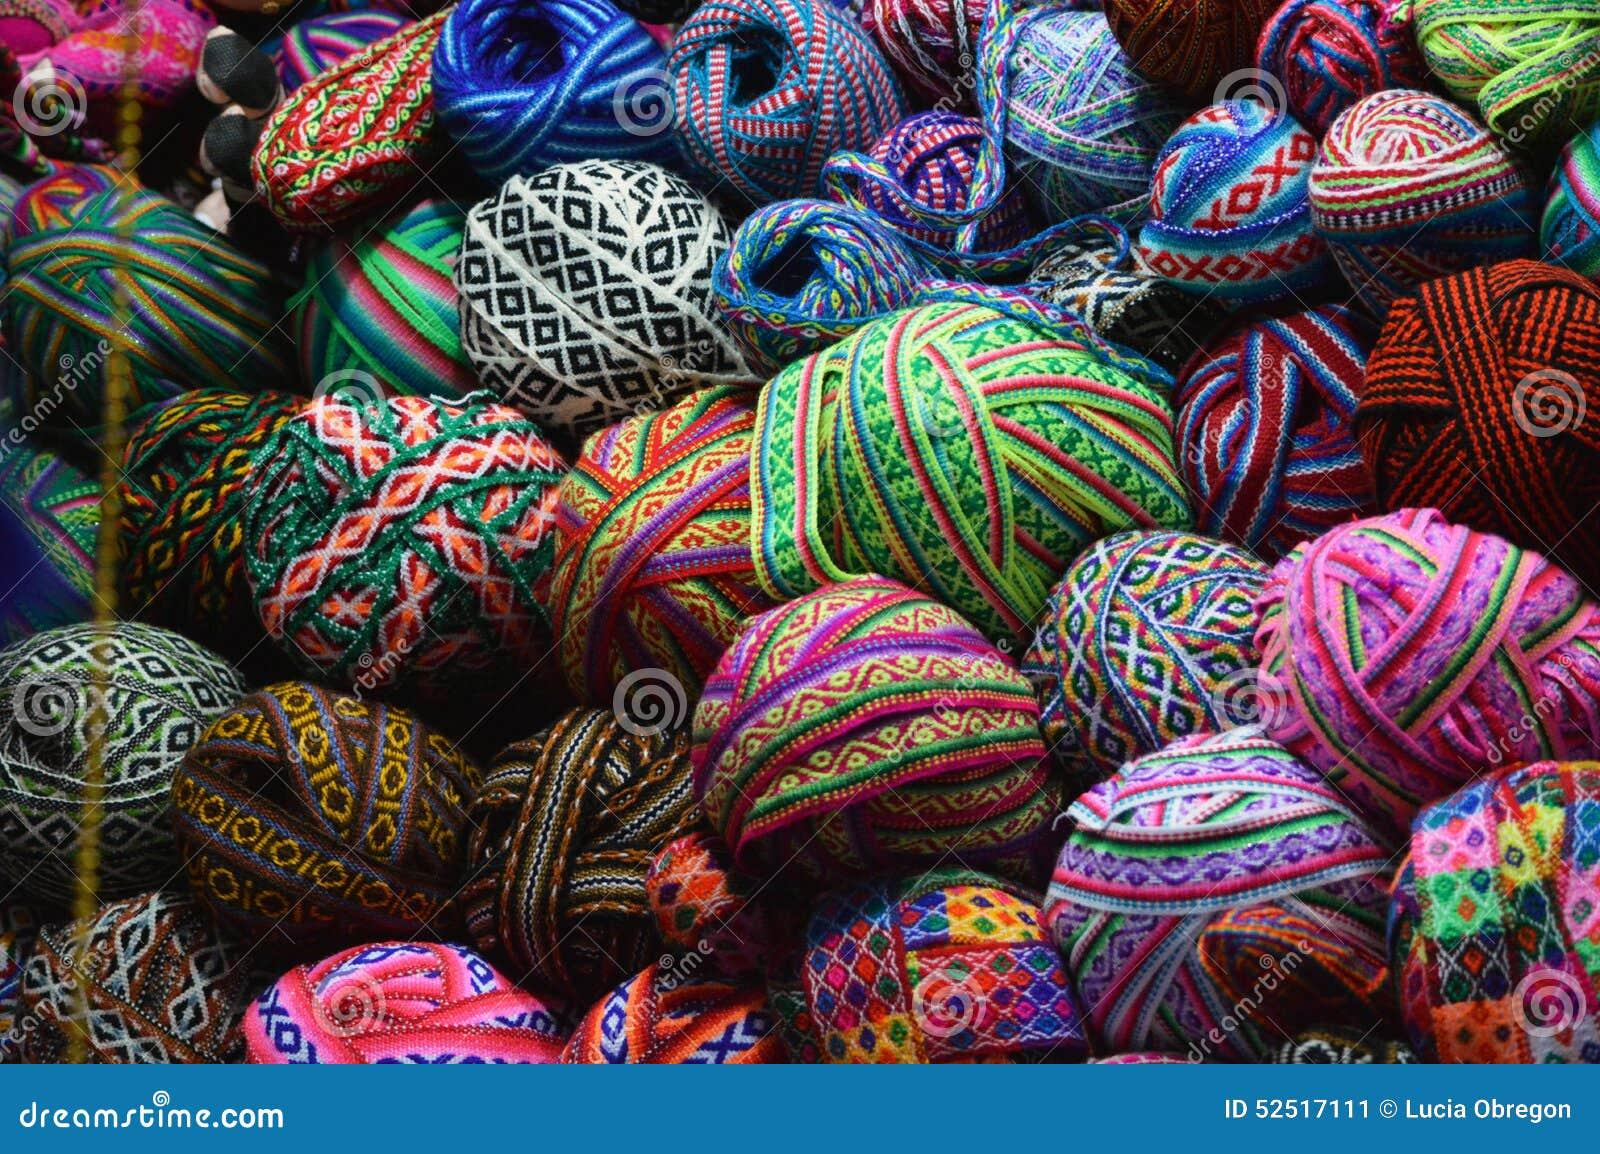 Colorful yarn balls on basket